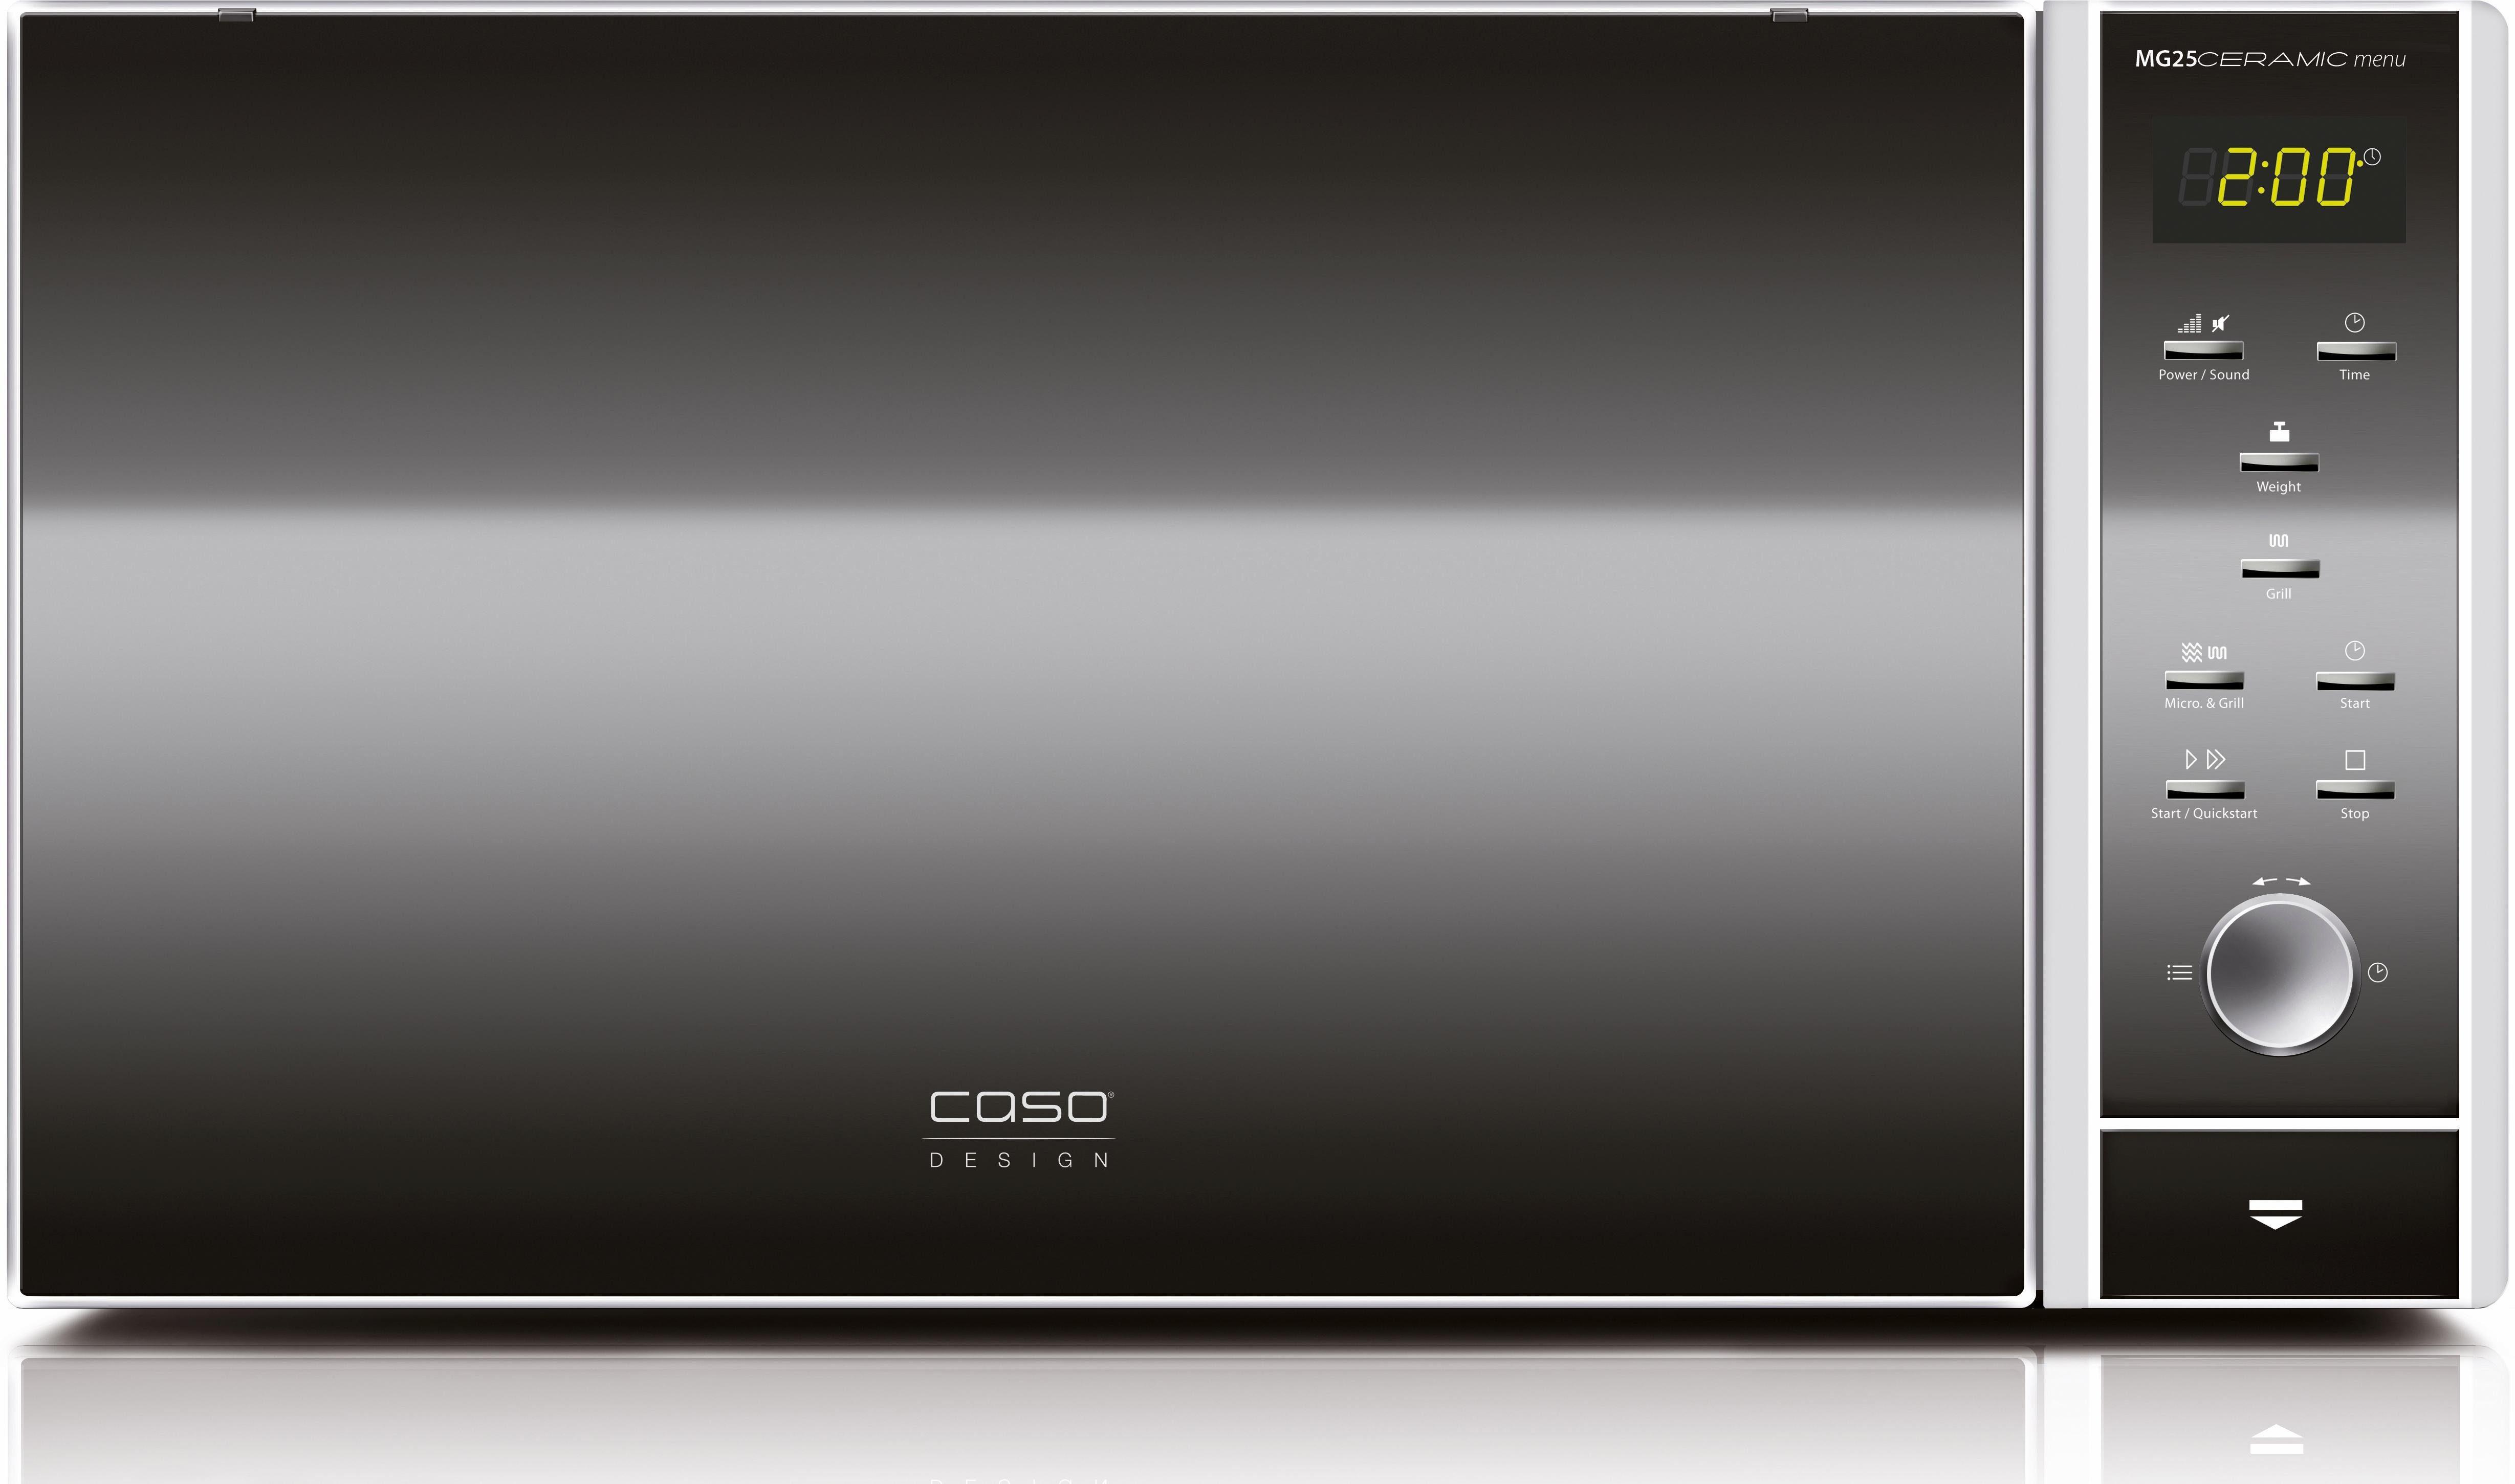 CASO Design Mikrowelle CASO MG25C menu 2in1, mit Grill, 25 Liter Garraum, 900 Watt